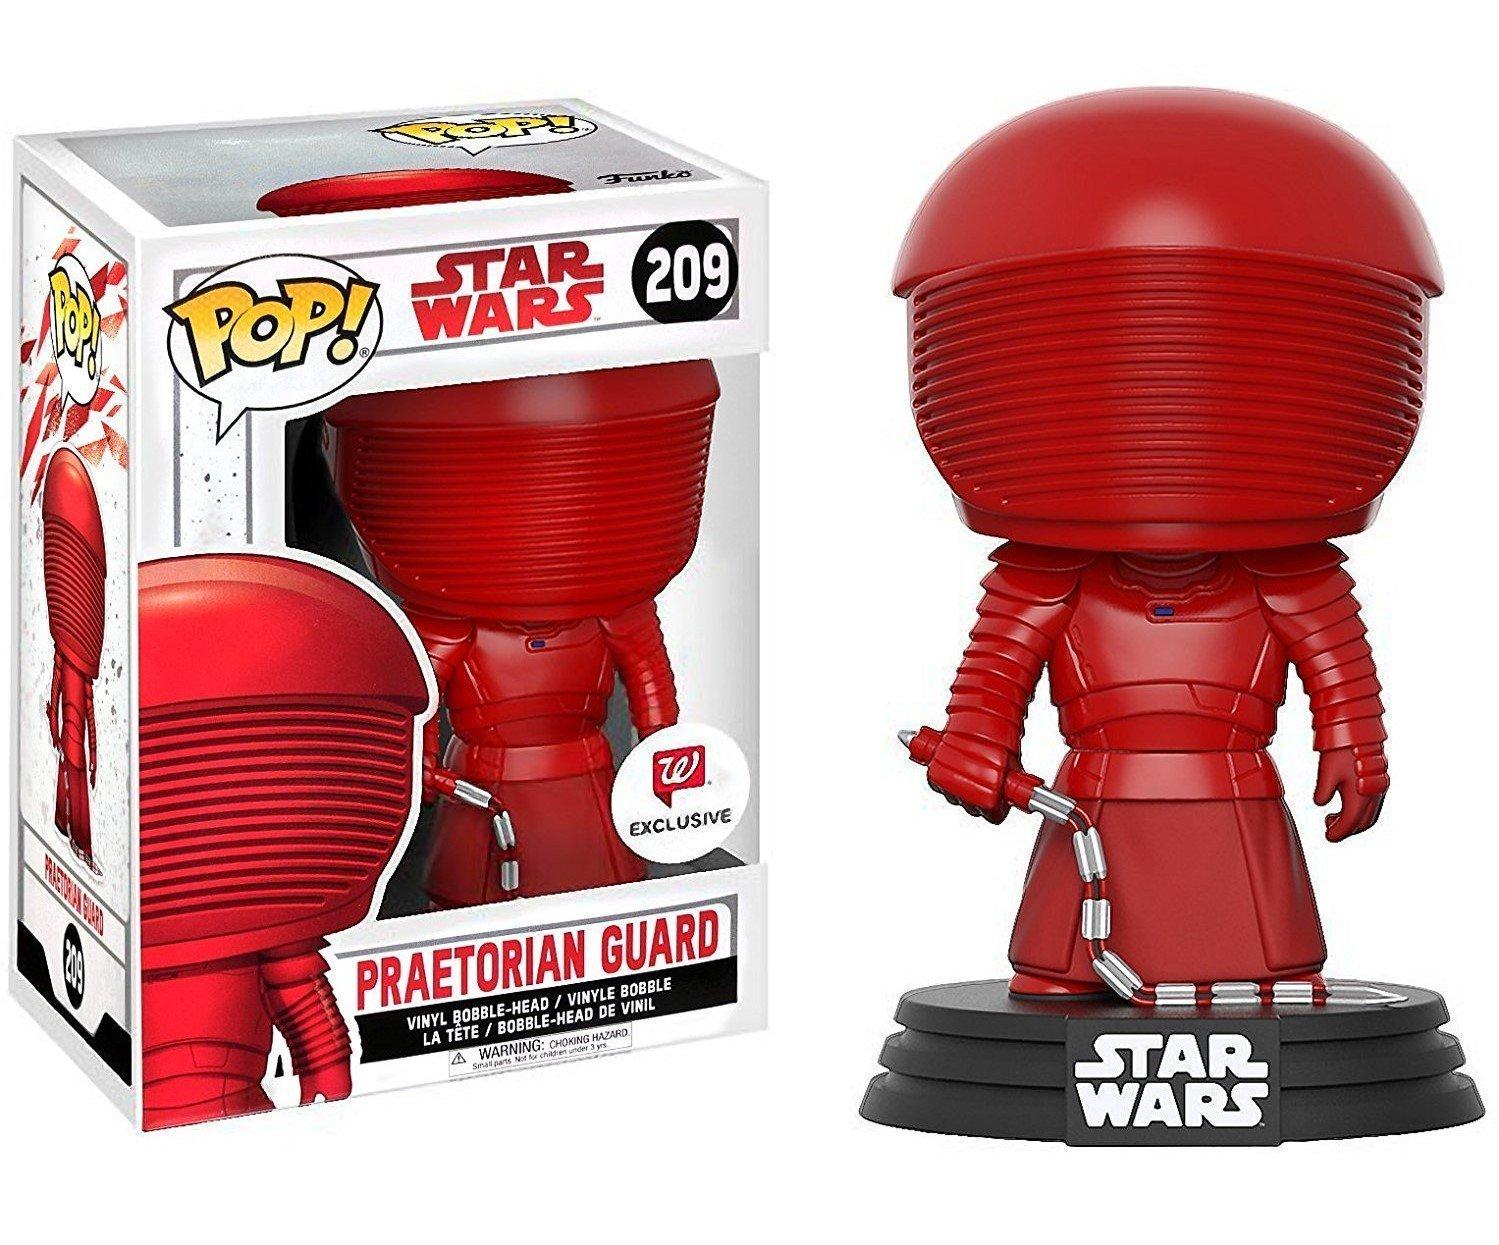 TLJ Praetorian Guards Bobble Head Toy Bundle 3